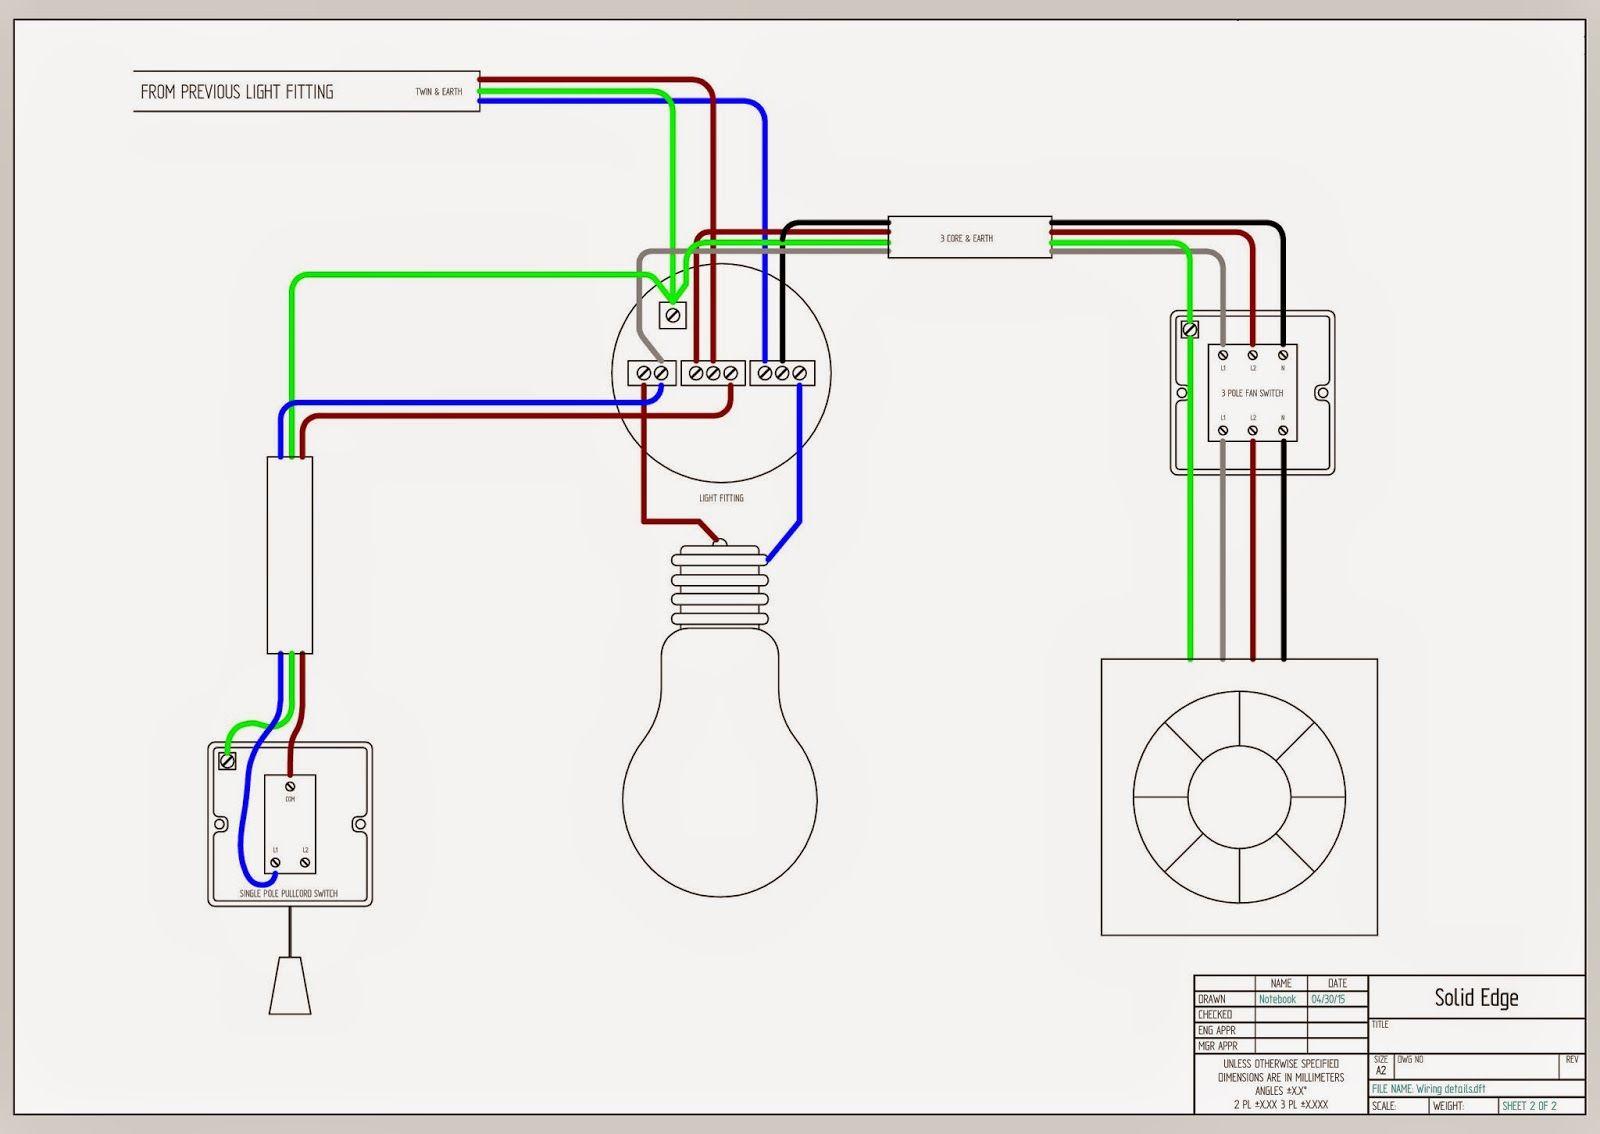 bathroom exhaust fan with light wiring diagram jeep jk sub latest posts under design